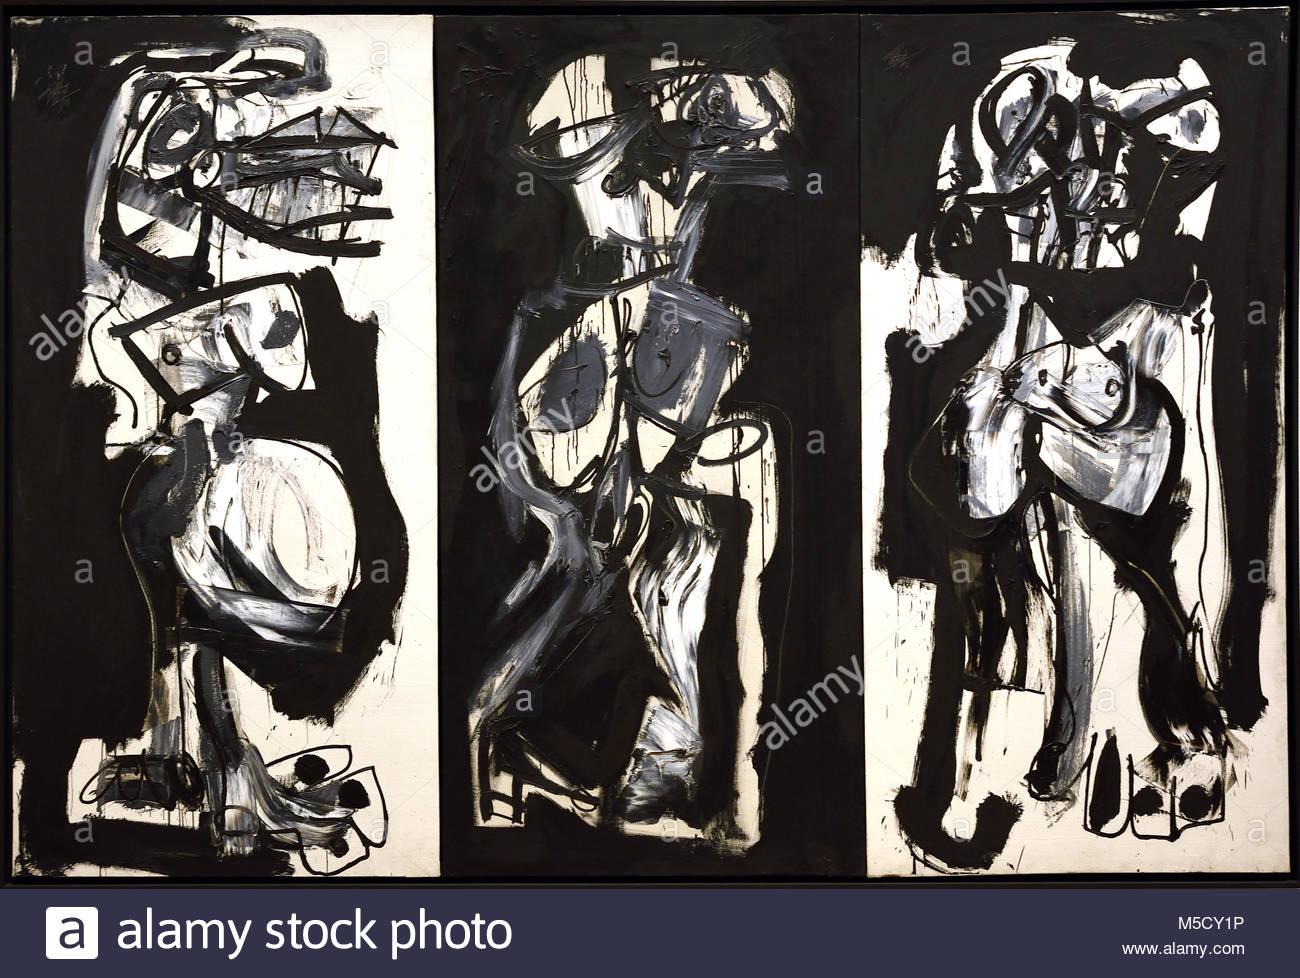 The Three Graces 1959, Antonio Saura (1930-1980) 20th, century, Spain, Spanish, - Stock Image